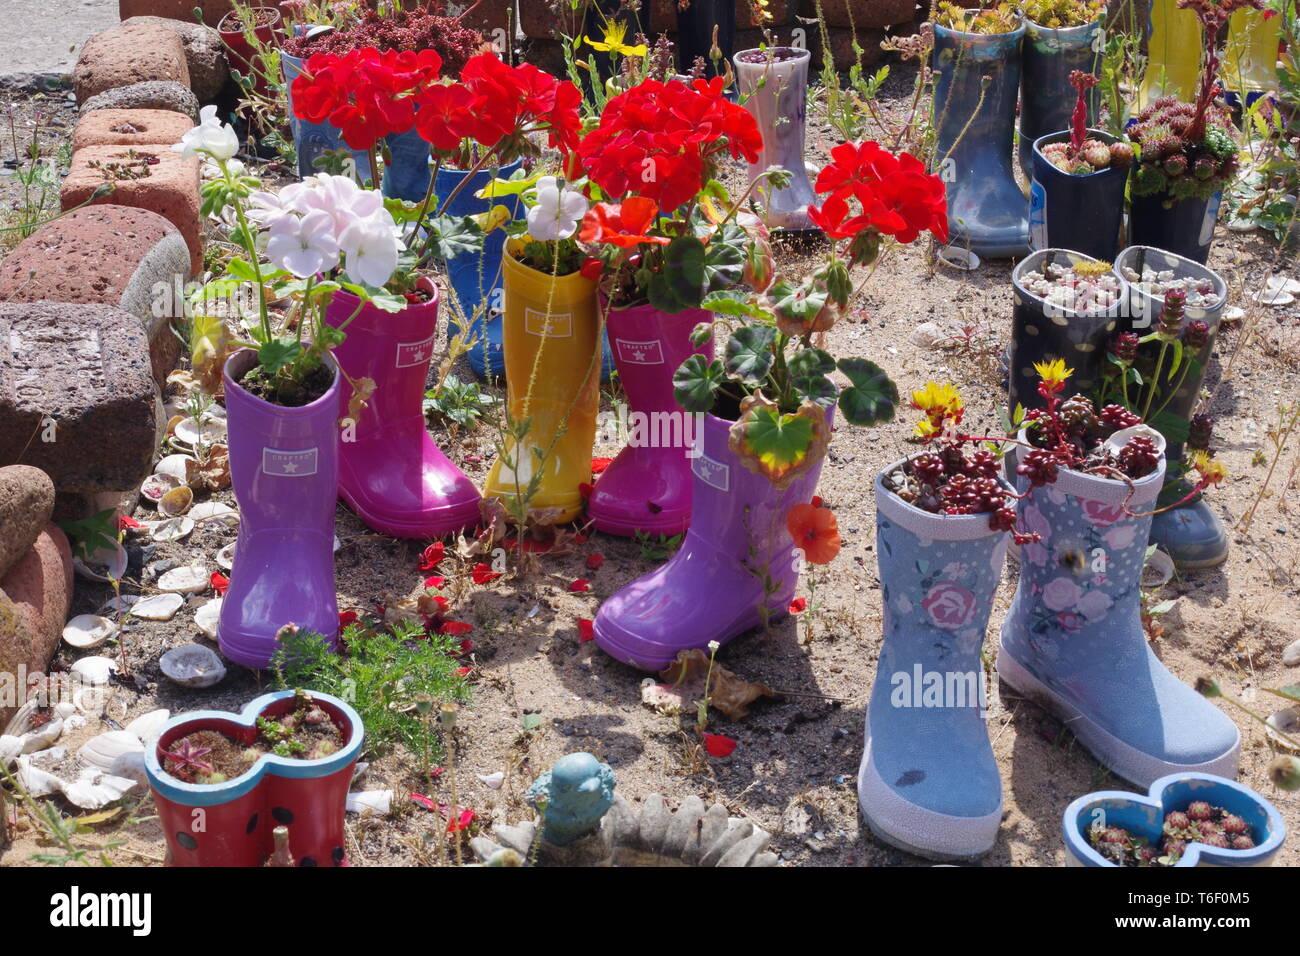 St Monans Welly Boot Garden. Fife, Scotland, UK. Stock Photo